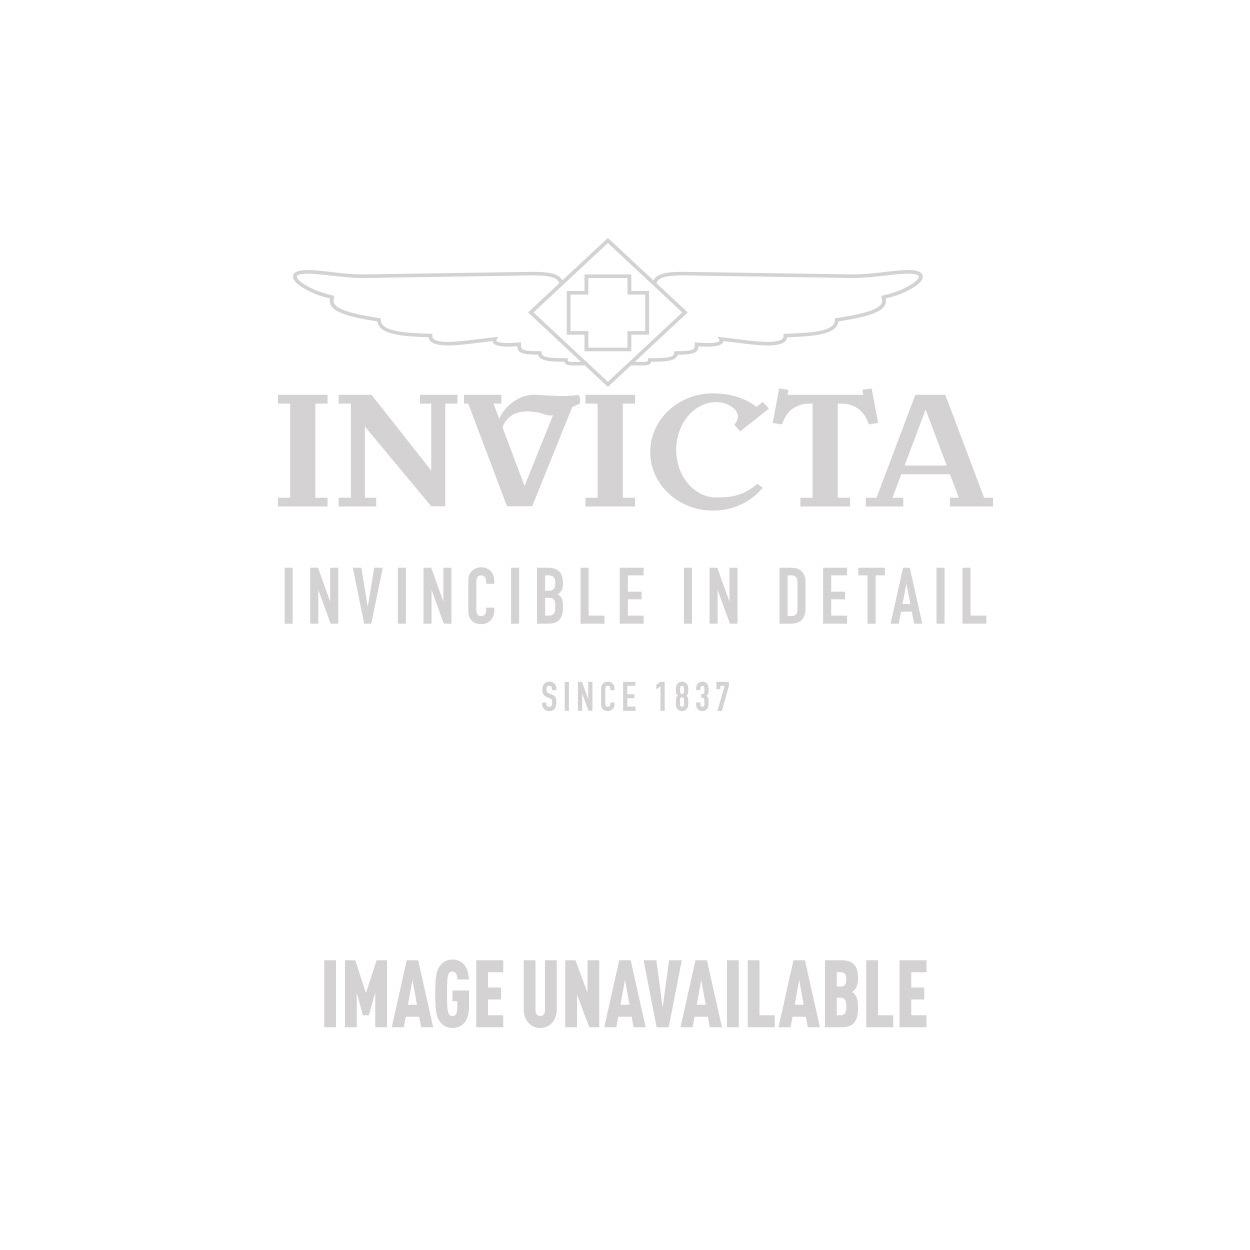 Invicta I-Force Quartz Watch - Black, Stainless Steel case with Steel, Black tone Stainless Steel band - Model 90162